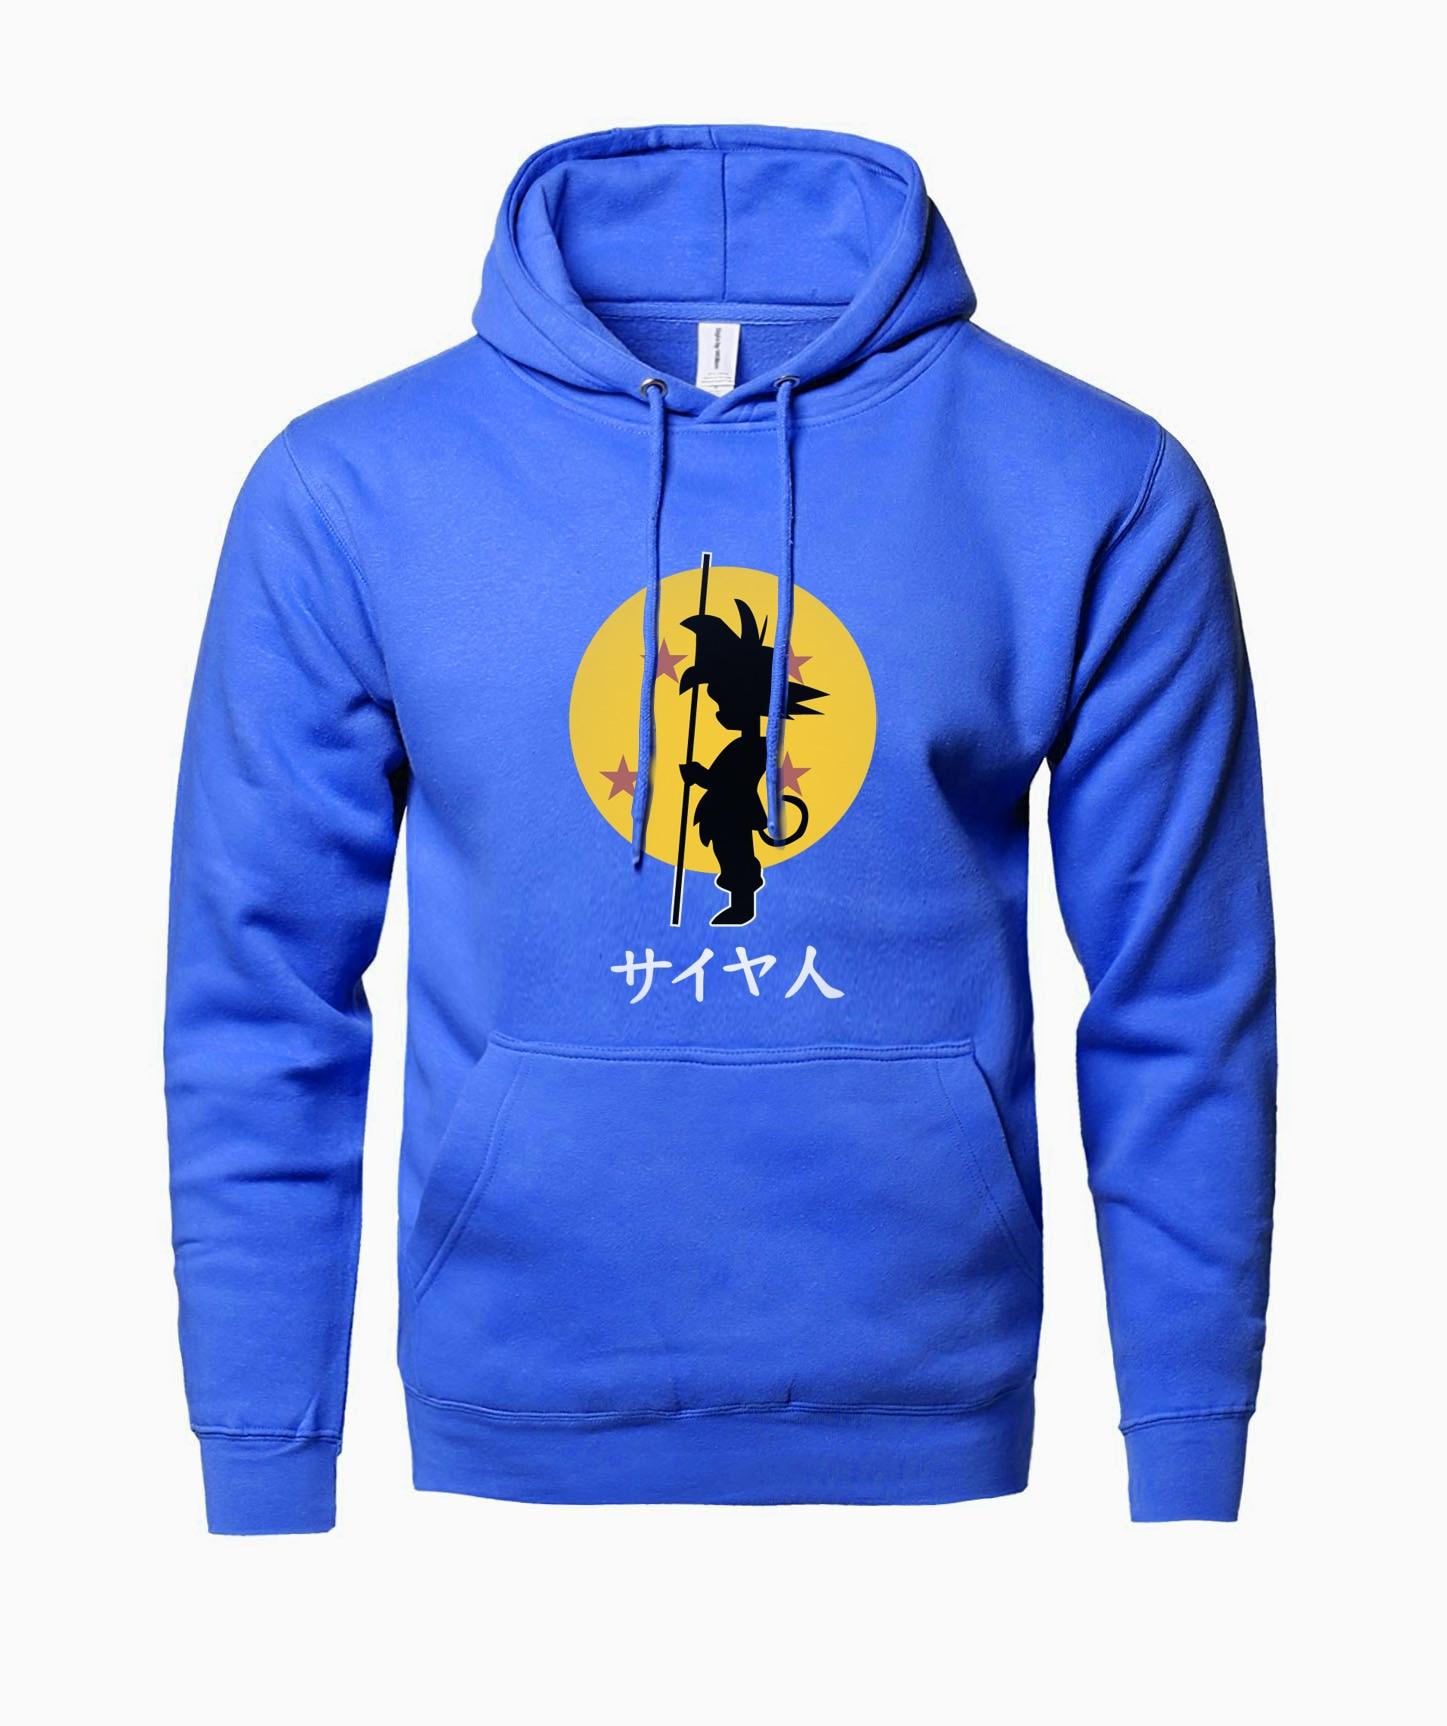 Hoodies & Sweatshirts Aikooki Yu Gi Oh Men 3d Sweatshirts Hoodies Fashion Pullover Hoodies 3d Men Winter Autumn Thin Sweatshirt 3d Casual Tracksuits